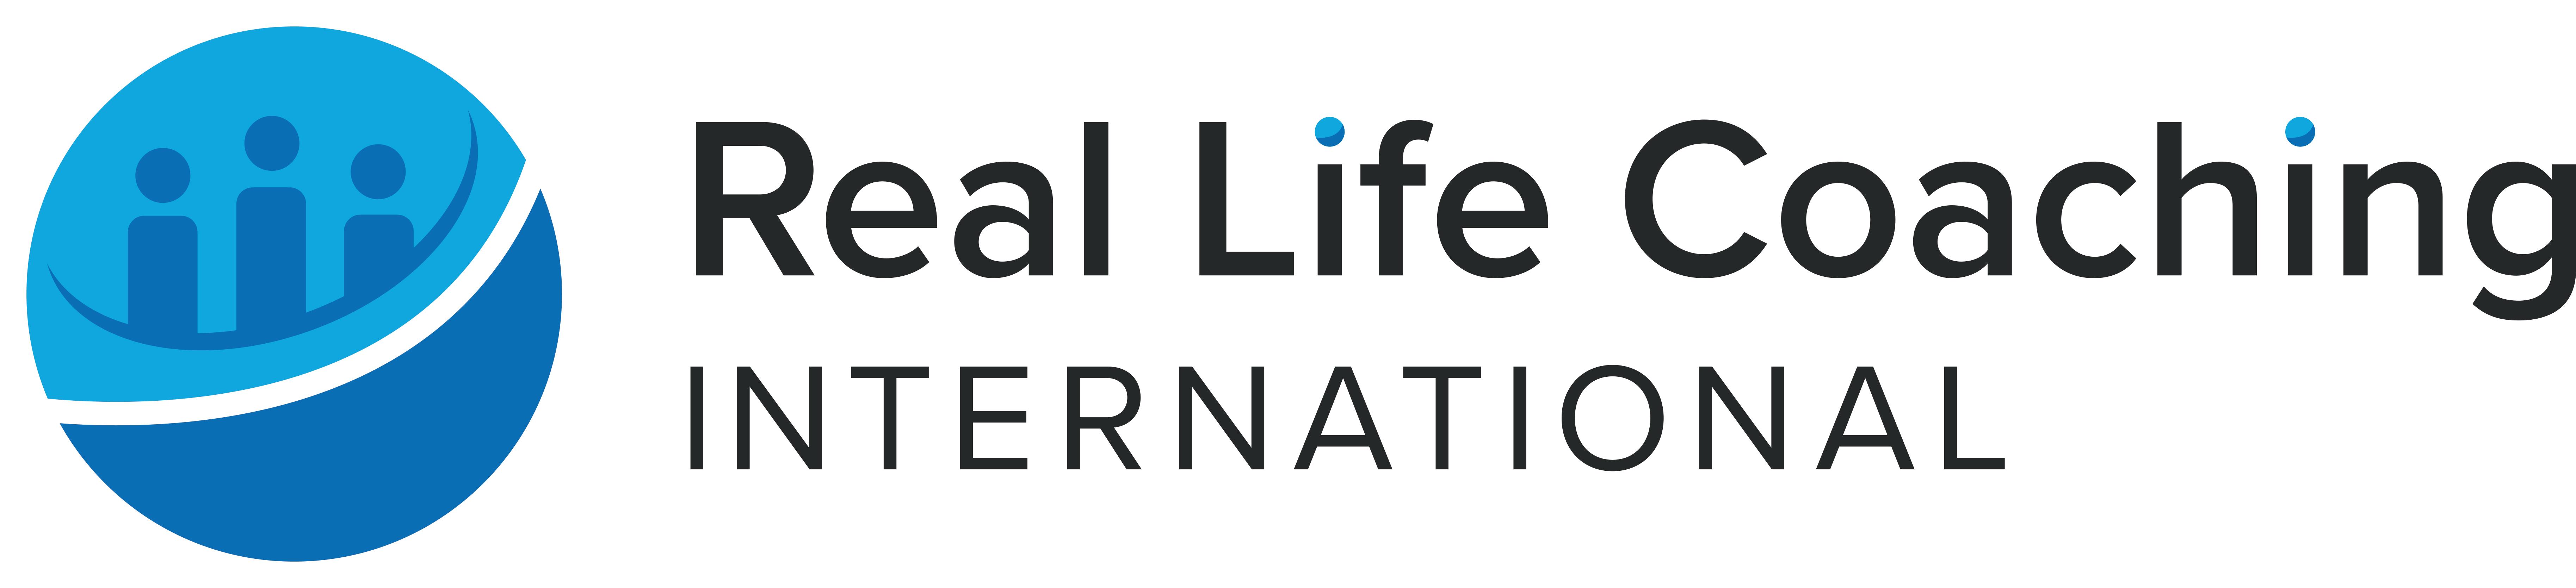 Real Life Coaching International